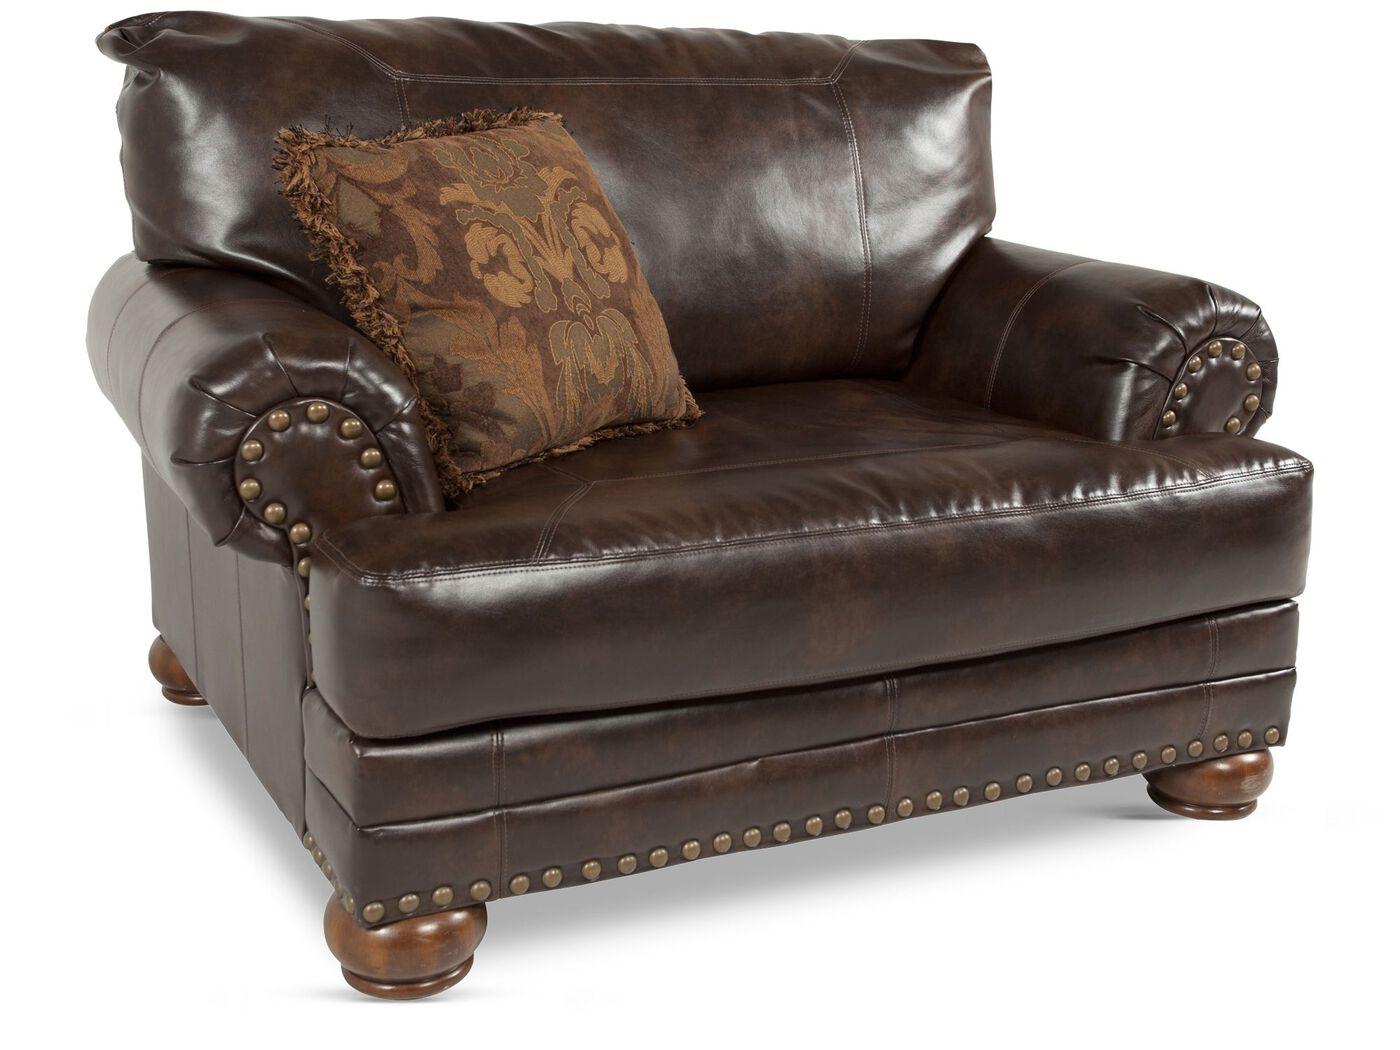 Leather Antique Chair Antique Furniture